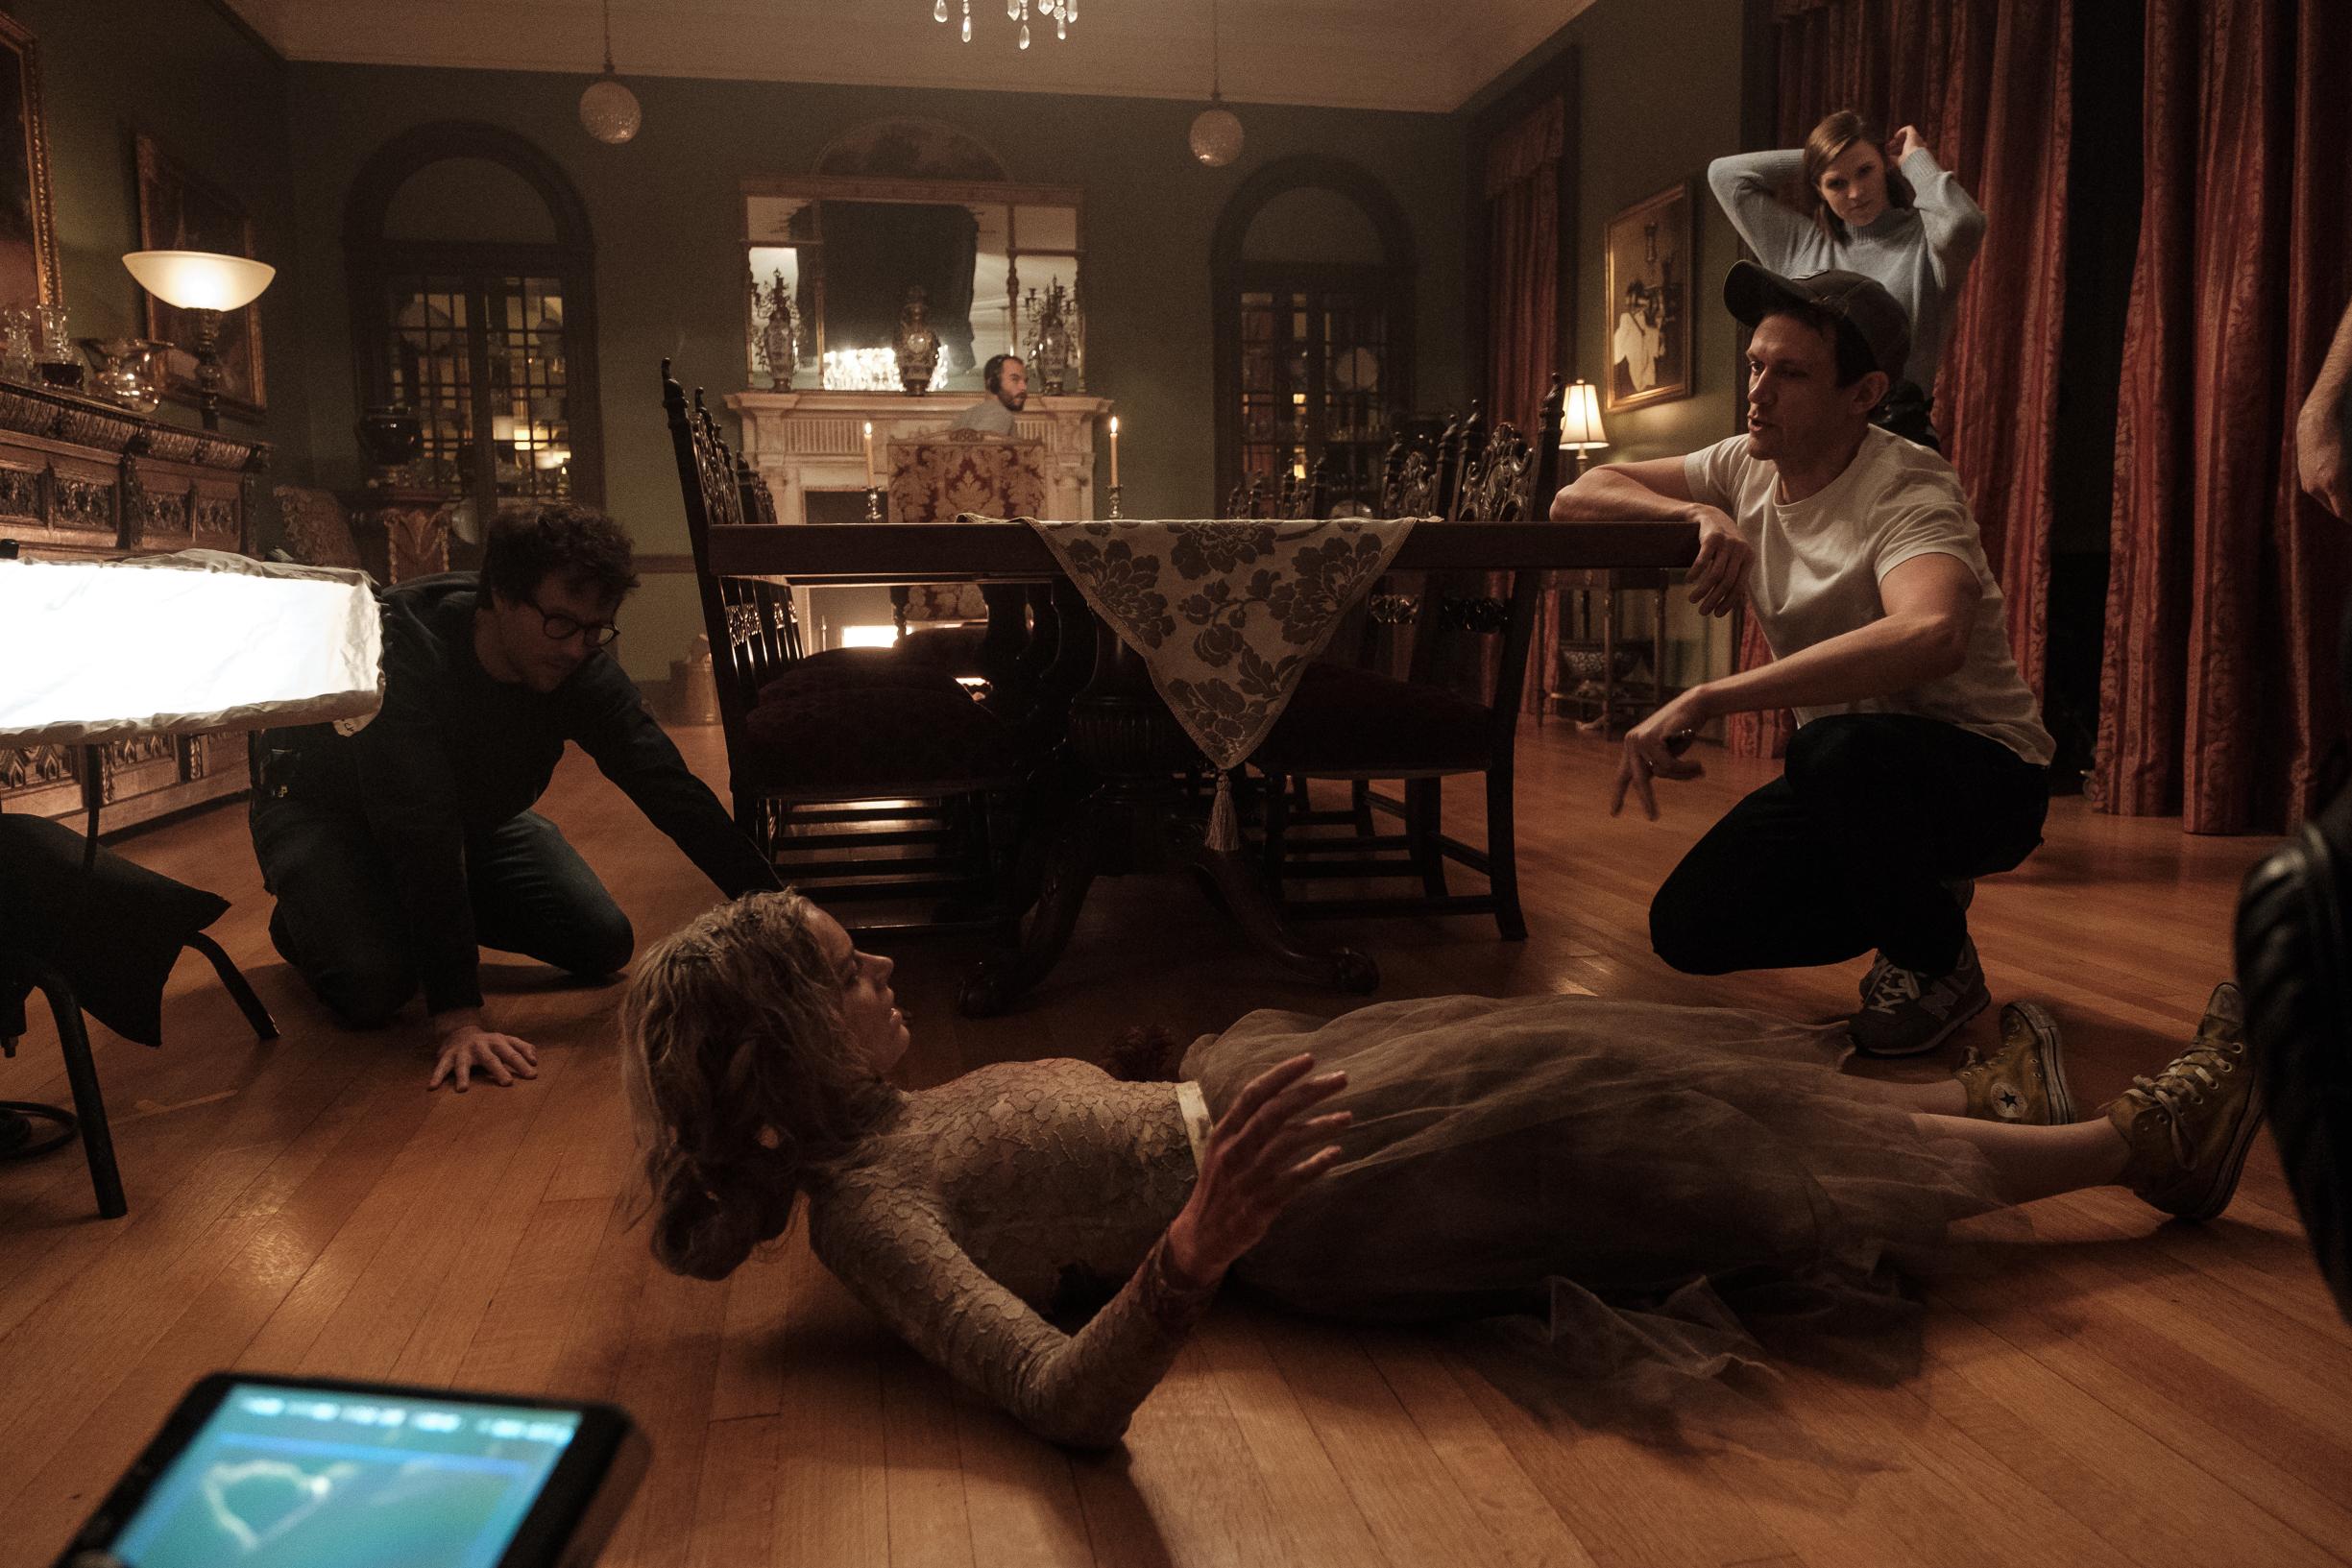 Matt Bettinelli-Olpin, Tyler Gillett, and Samara Weaving in Ready or Not (2019)